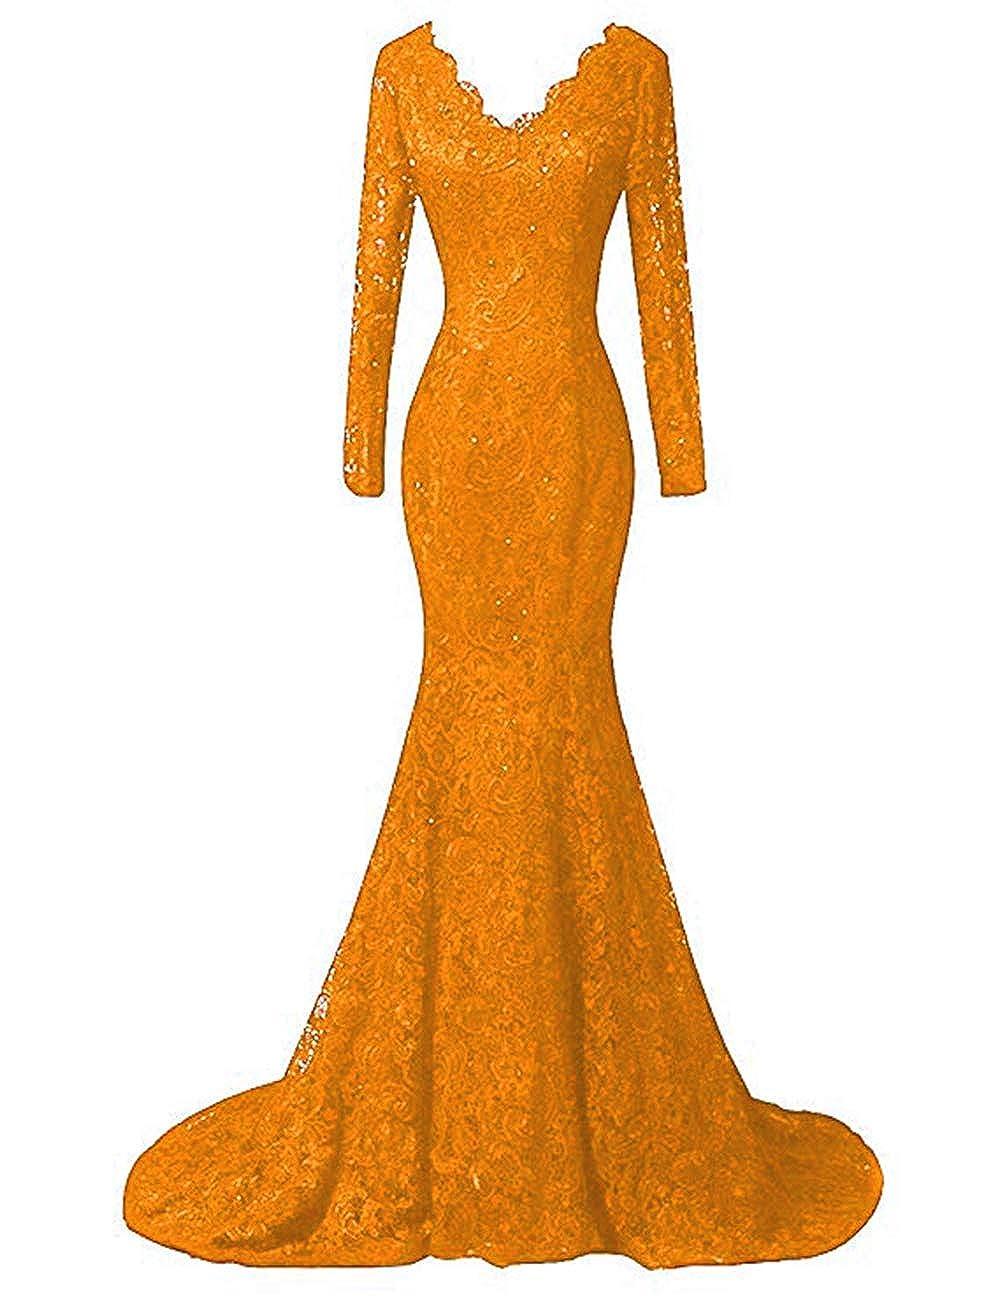 orange Ri Yun Women's Elegant Long Sleeves Lace Prom Dresses Mermaid VNeck Beaded Formal Evening Party Gowns